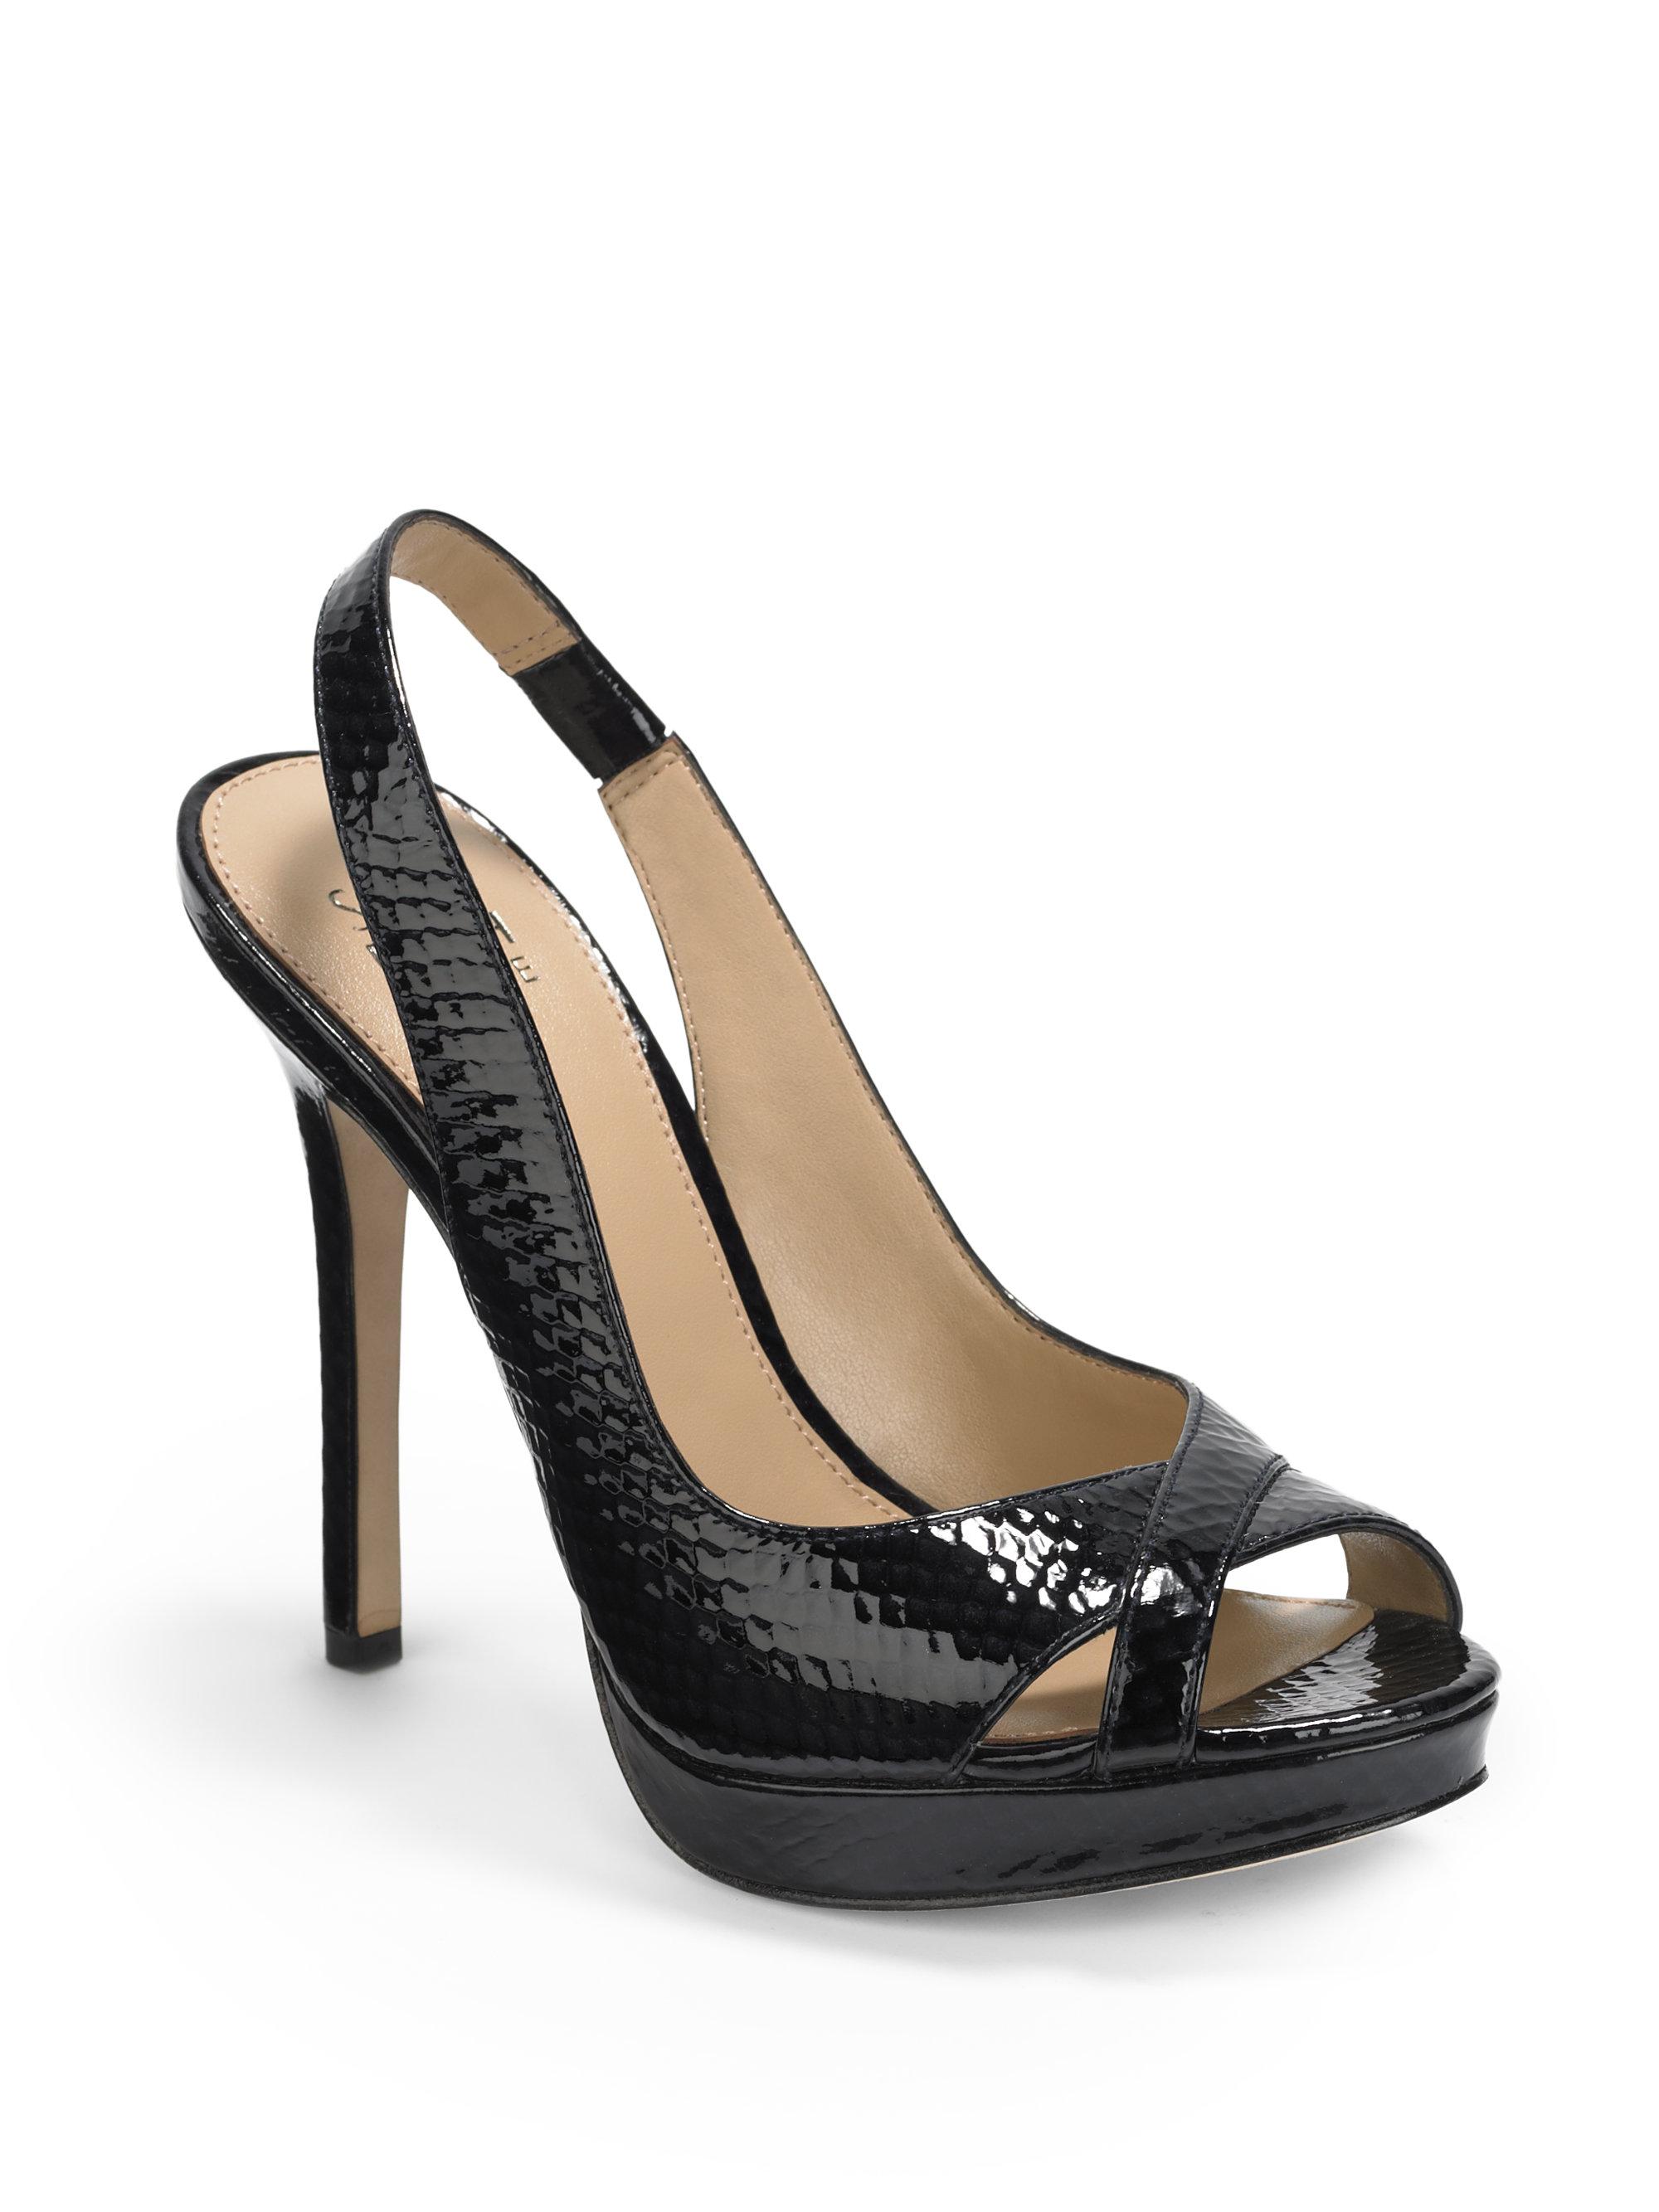 saks fifth avenue snakeembossed patent platform sandals in